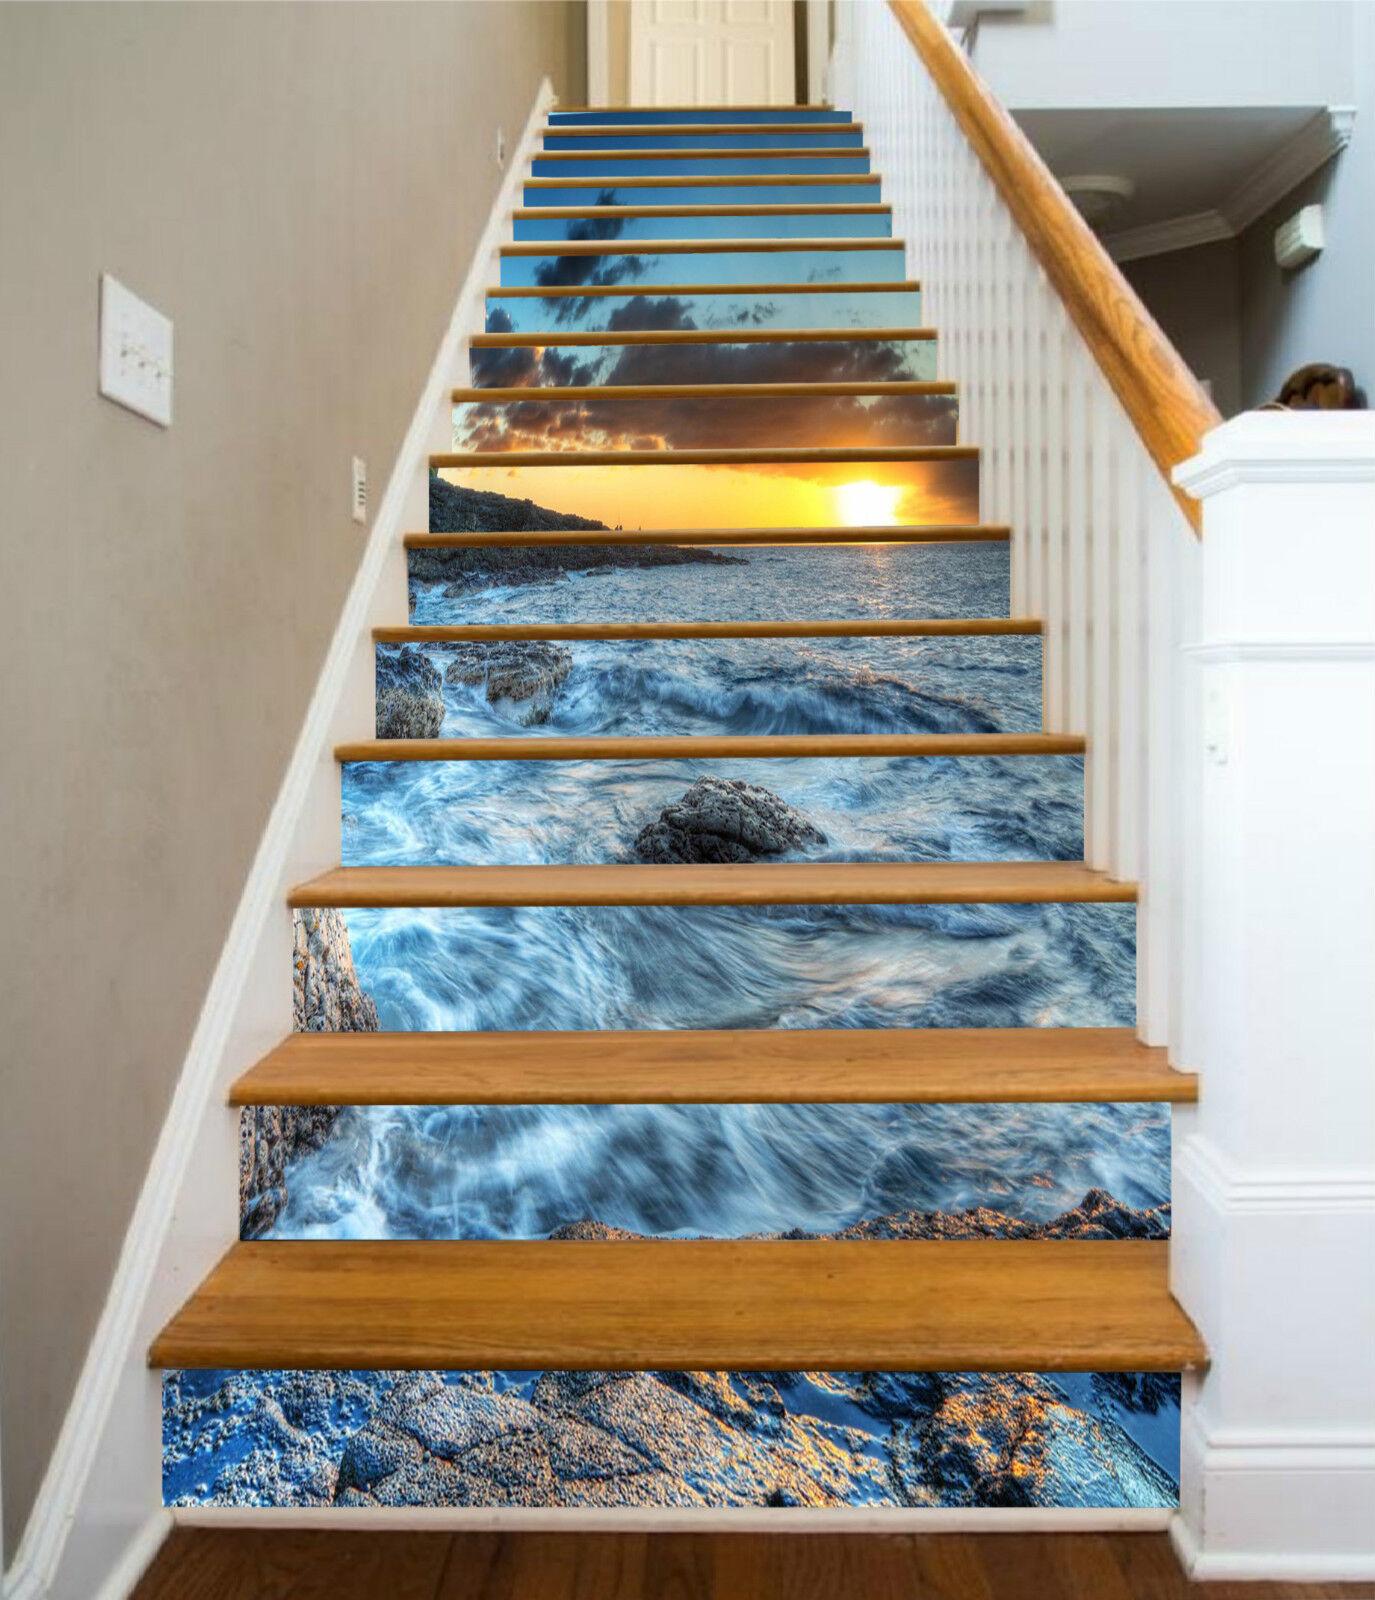 3D Abend Welle 211 Stair Risers Dekoration Fototapete Vinyl Aufkleber Tapete DE